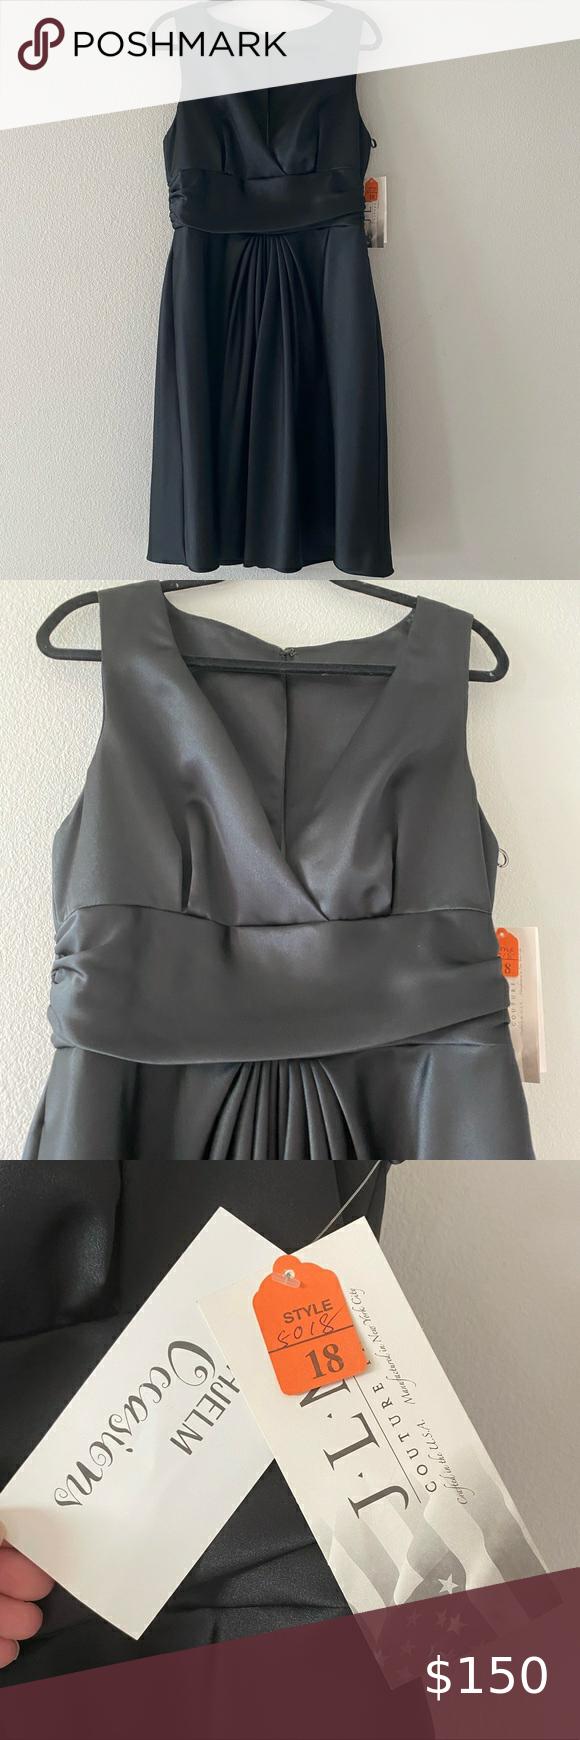 Nwt Jim Hjelm Occasions Satin Black Dress In 2021 Black Satin Dress Maxi Knit Dress Casual Day Dresses [ 1740 x 580 Pixel ]